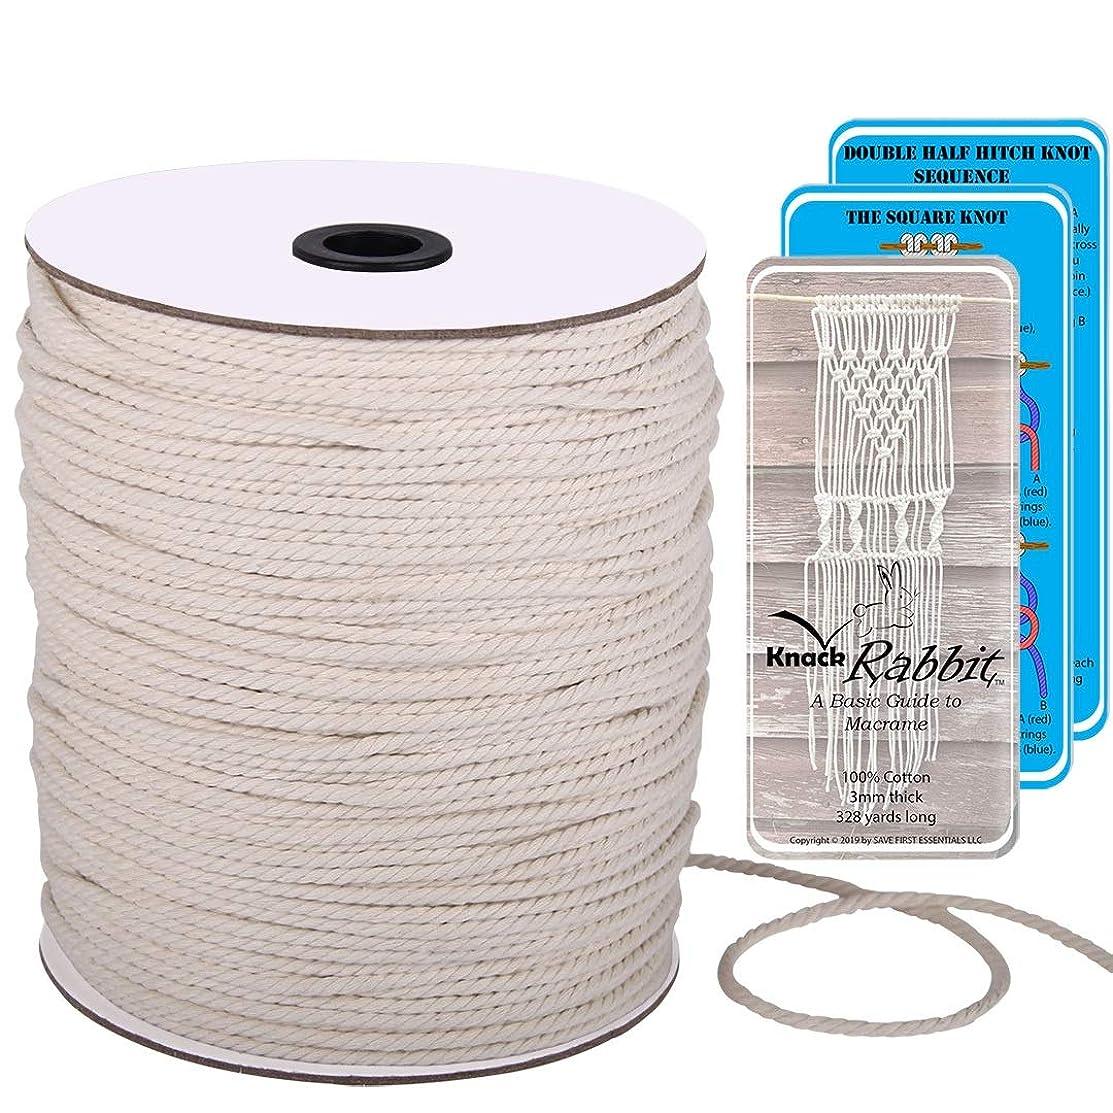 Macrame Cord 3mm x 328 Yard Bulk (300 Meters) | DIY Craft 3mm Macrame Cord | Natural Cotton Rope Macrame Supplies | 3 Strand Twisted Macrame Rope for Macrame Wall Hanging, Plant Hanger, Rope Lights